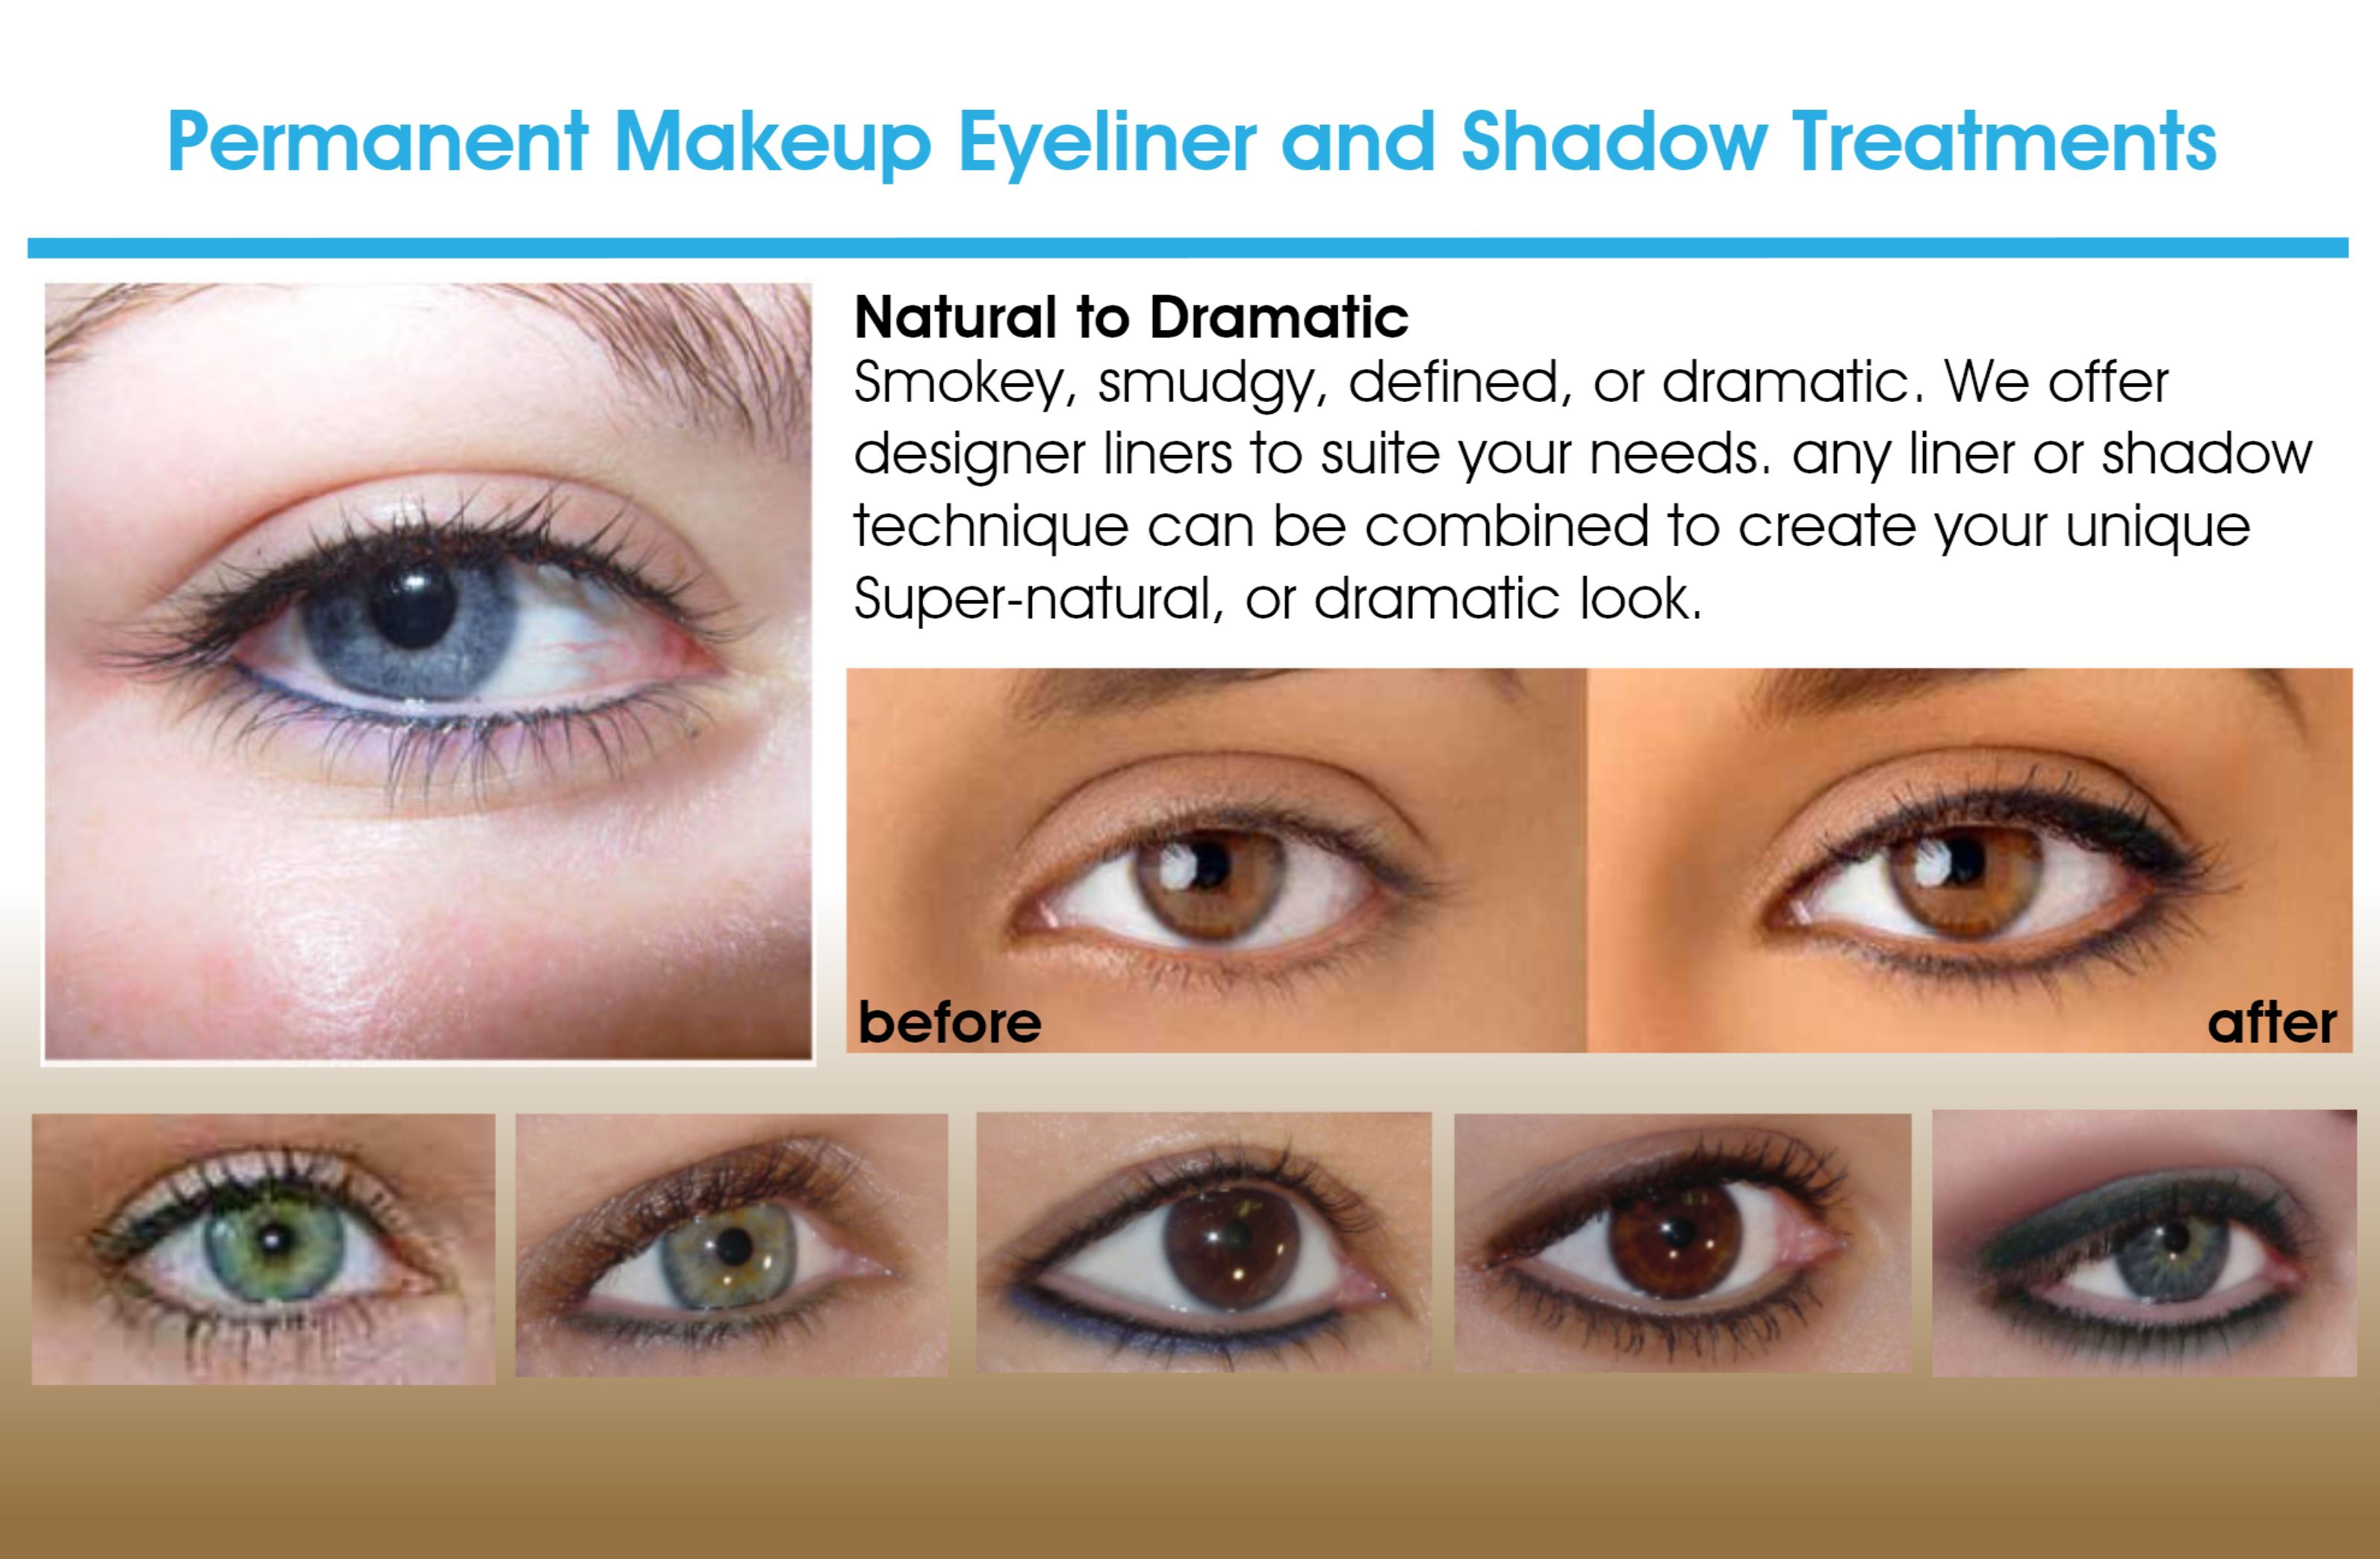 Eyeliner Permanent Eyeliner Eyeliner Tattoo Permanent Makeup Eyeliner